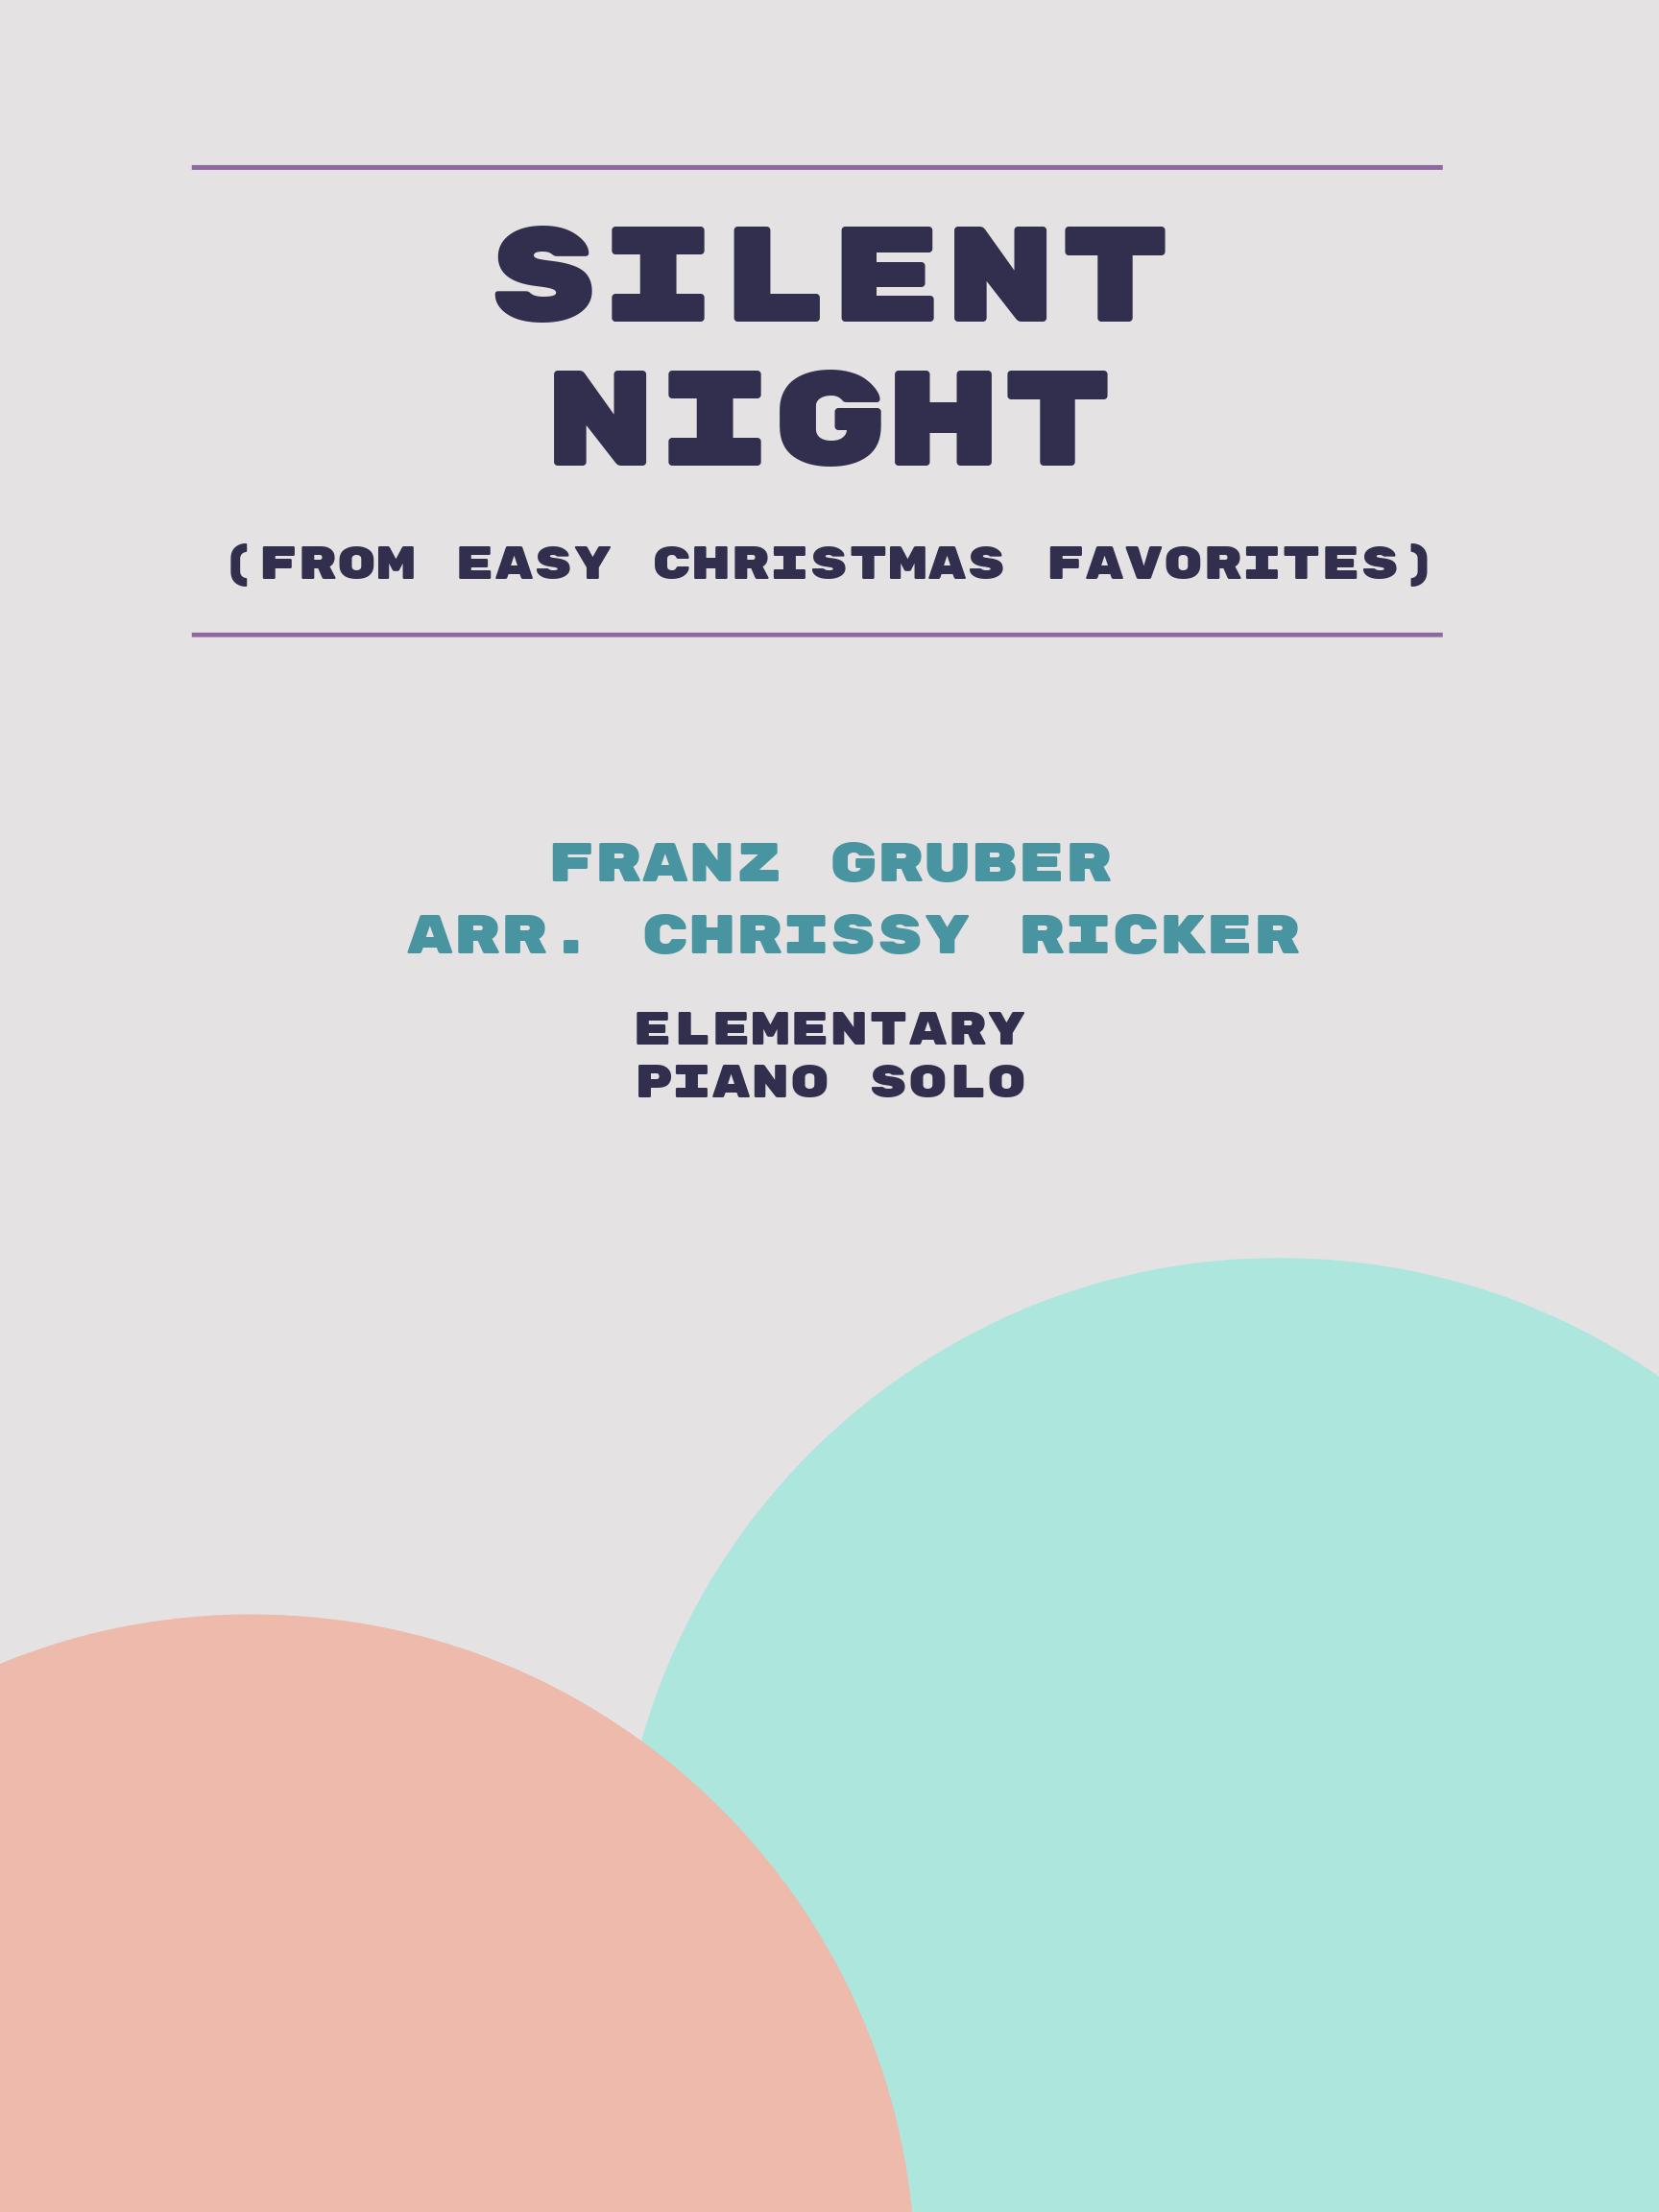 Silent Night by Franz Gruber